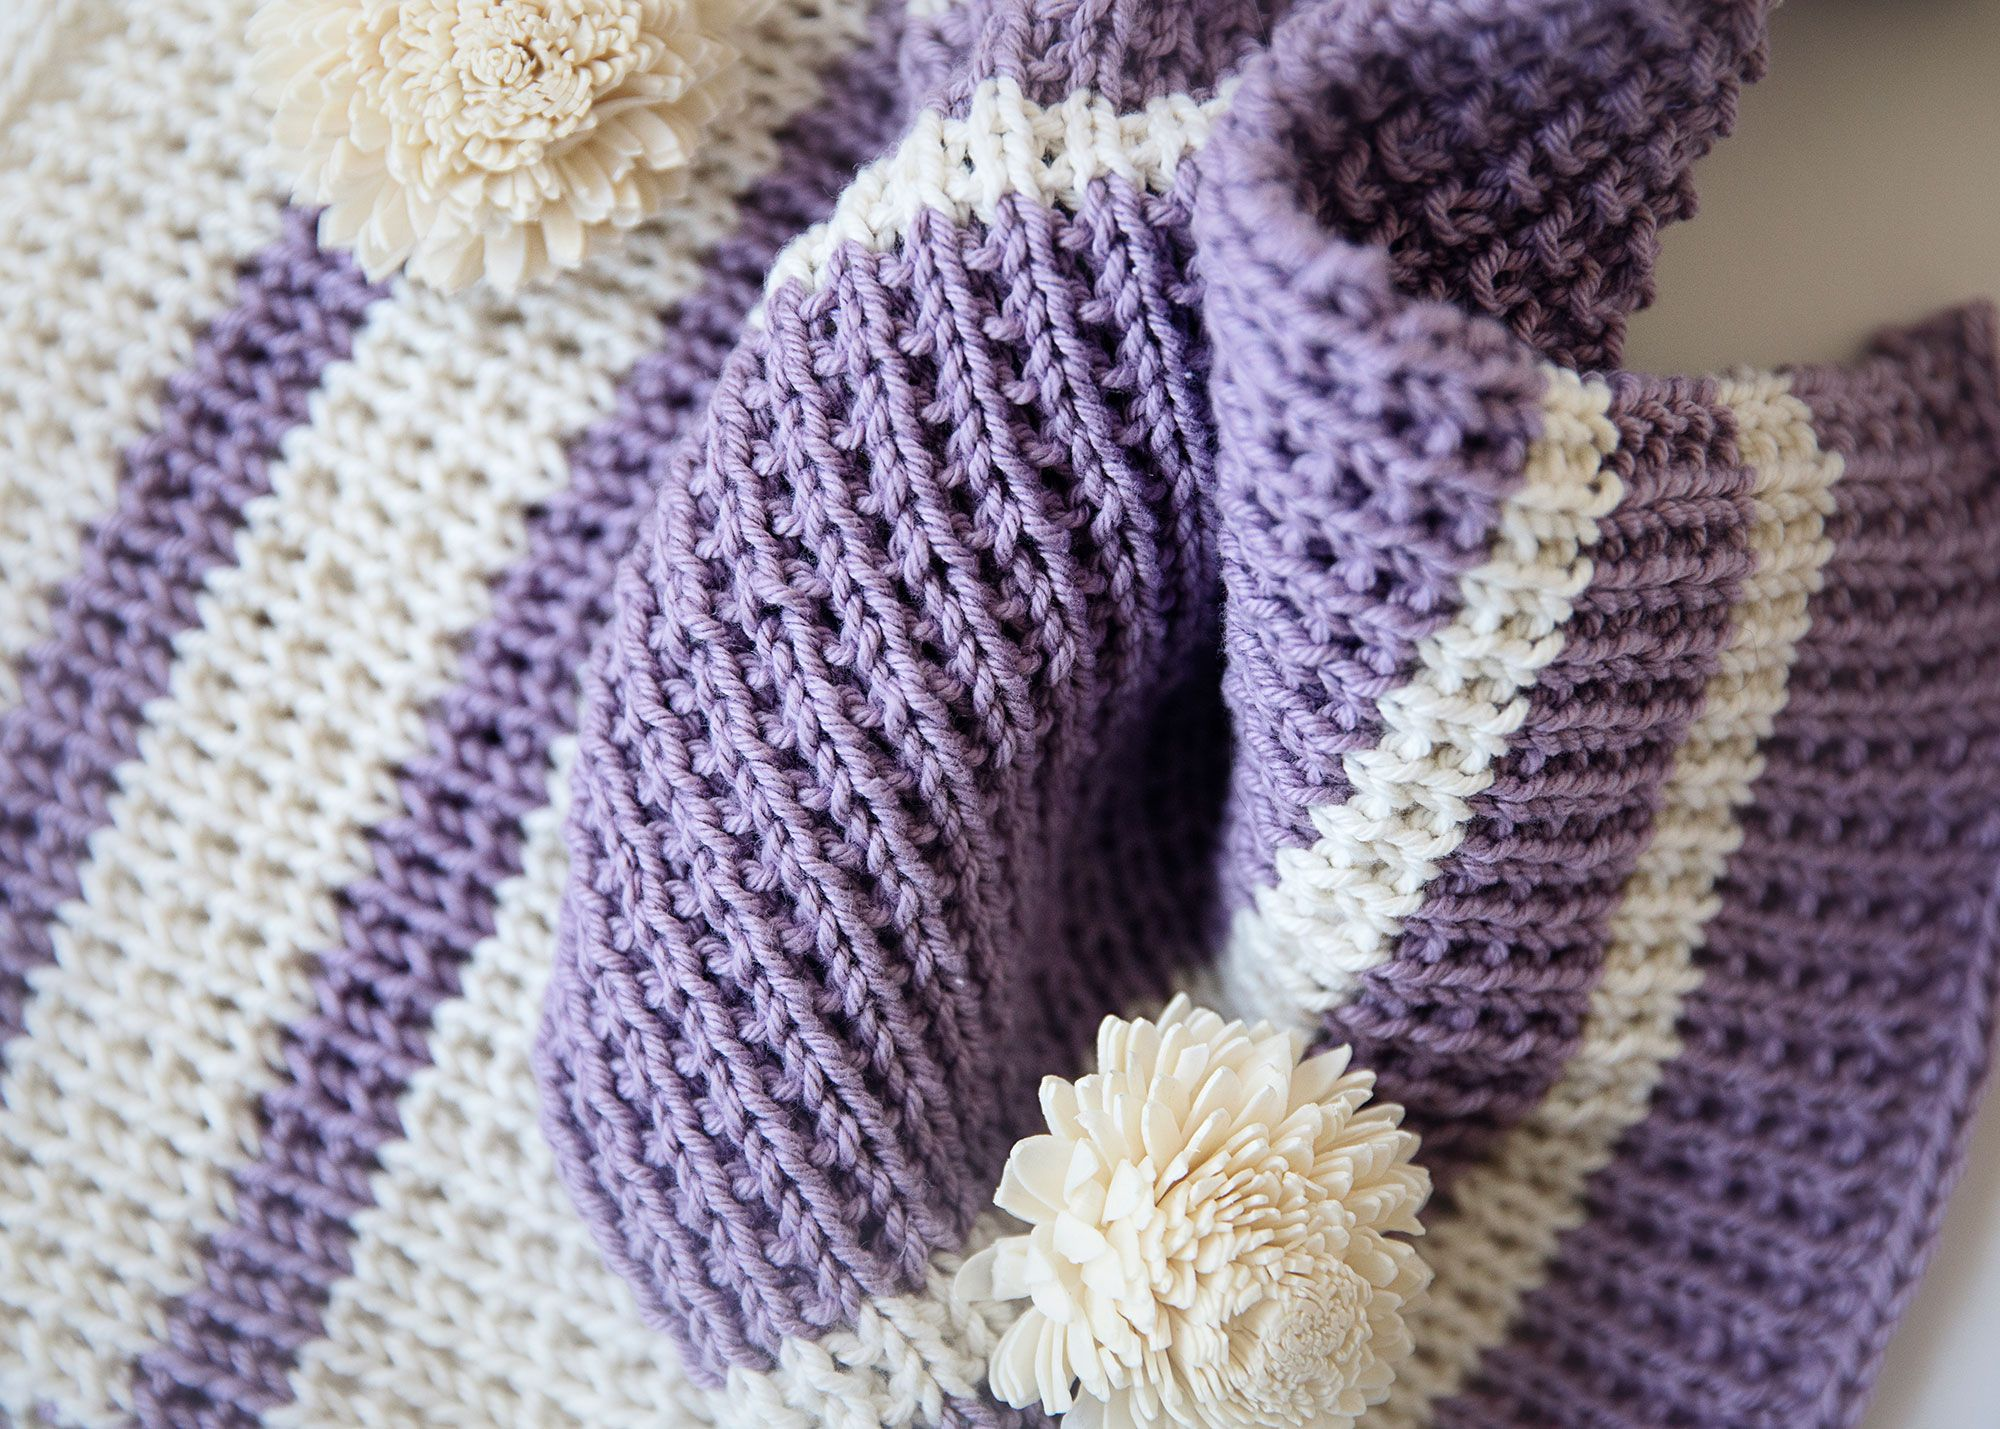 Knit Dishcloth Pattern | Knit and Crochet | Pinterest